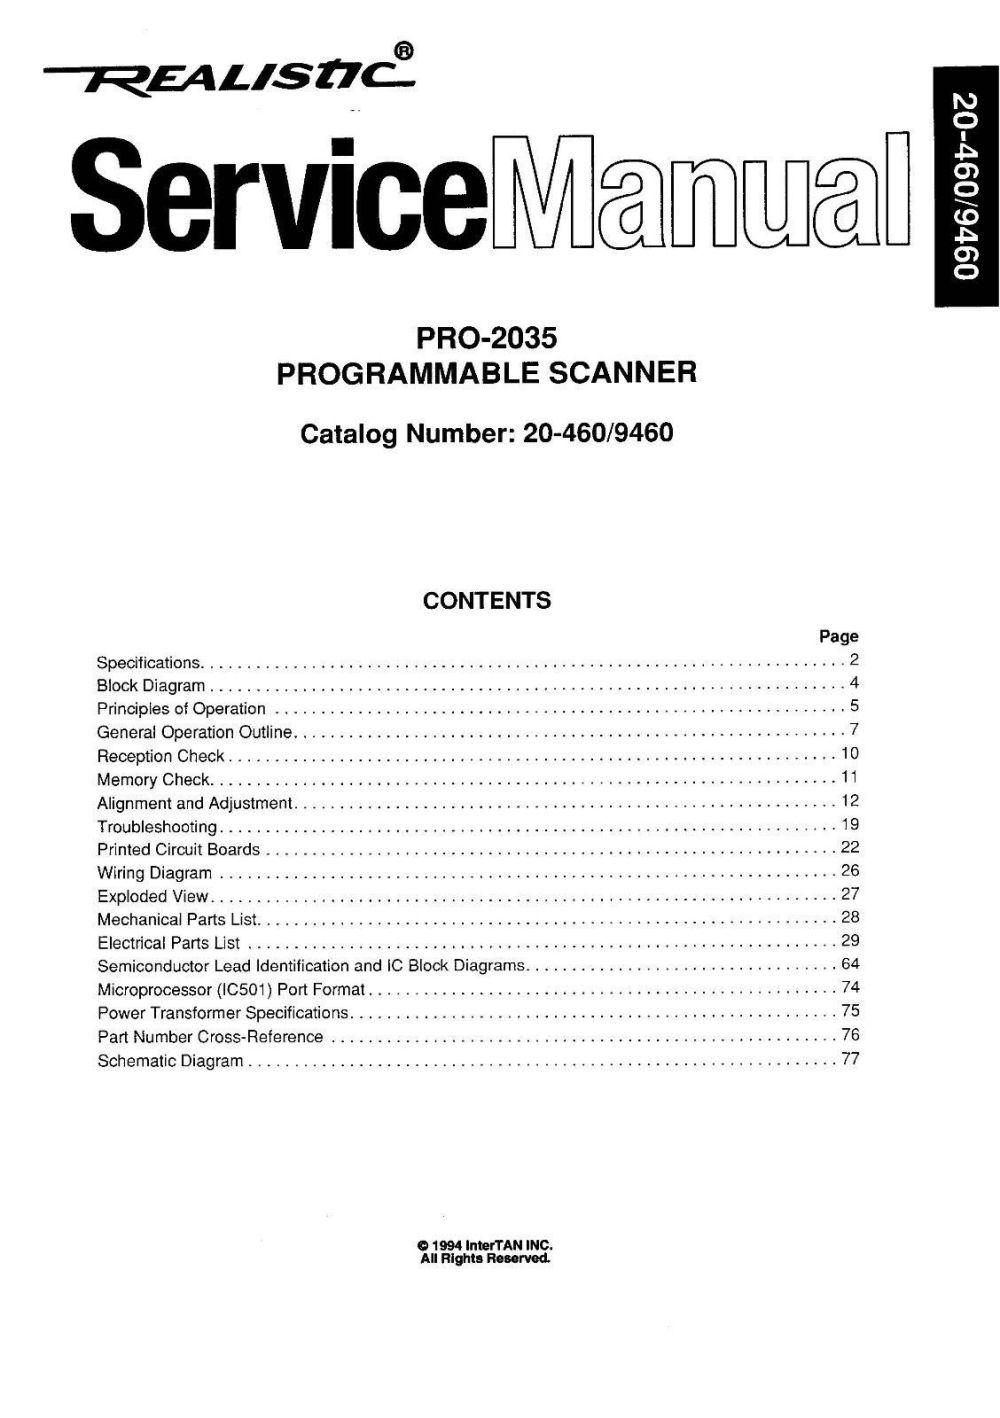 medium resolution of realistic pro 2035 service manual cdrom pdf